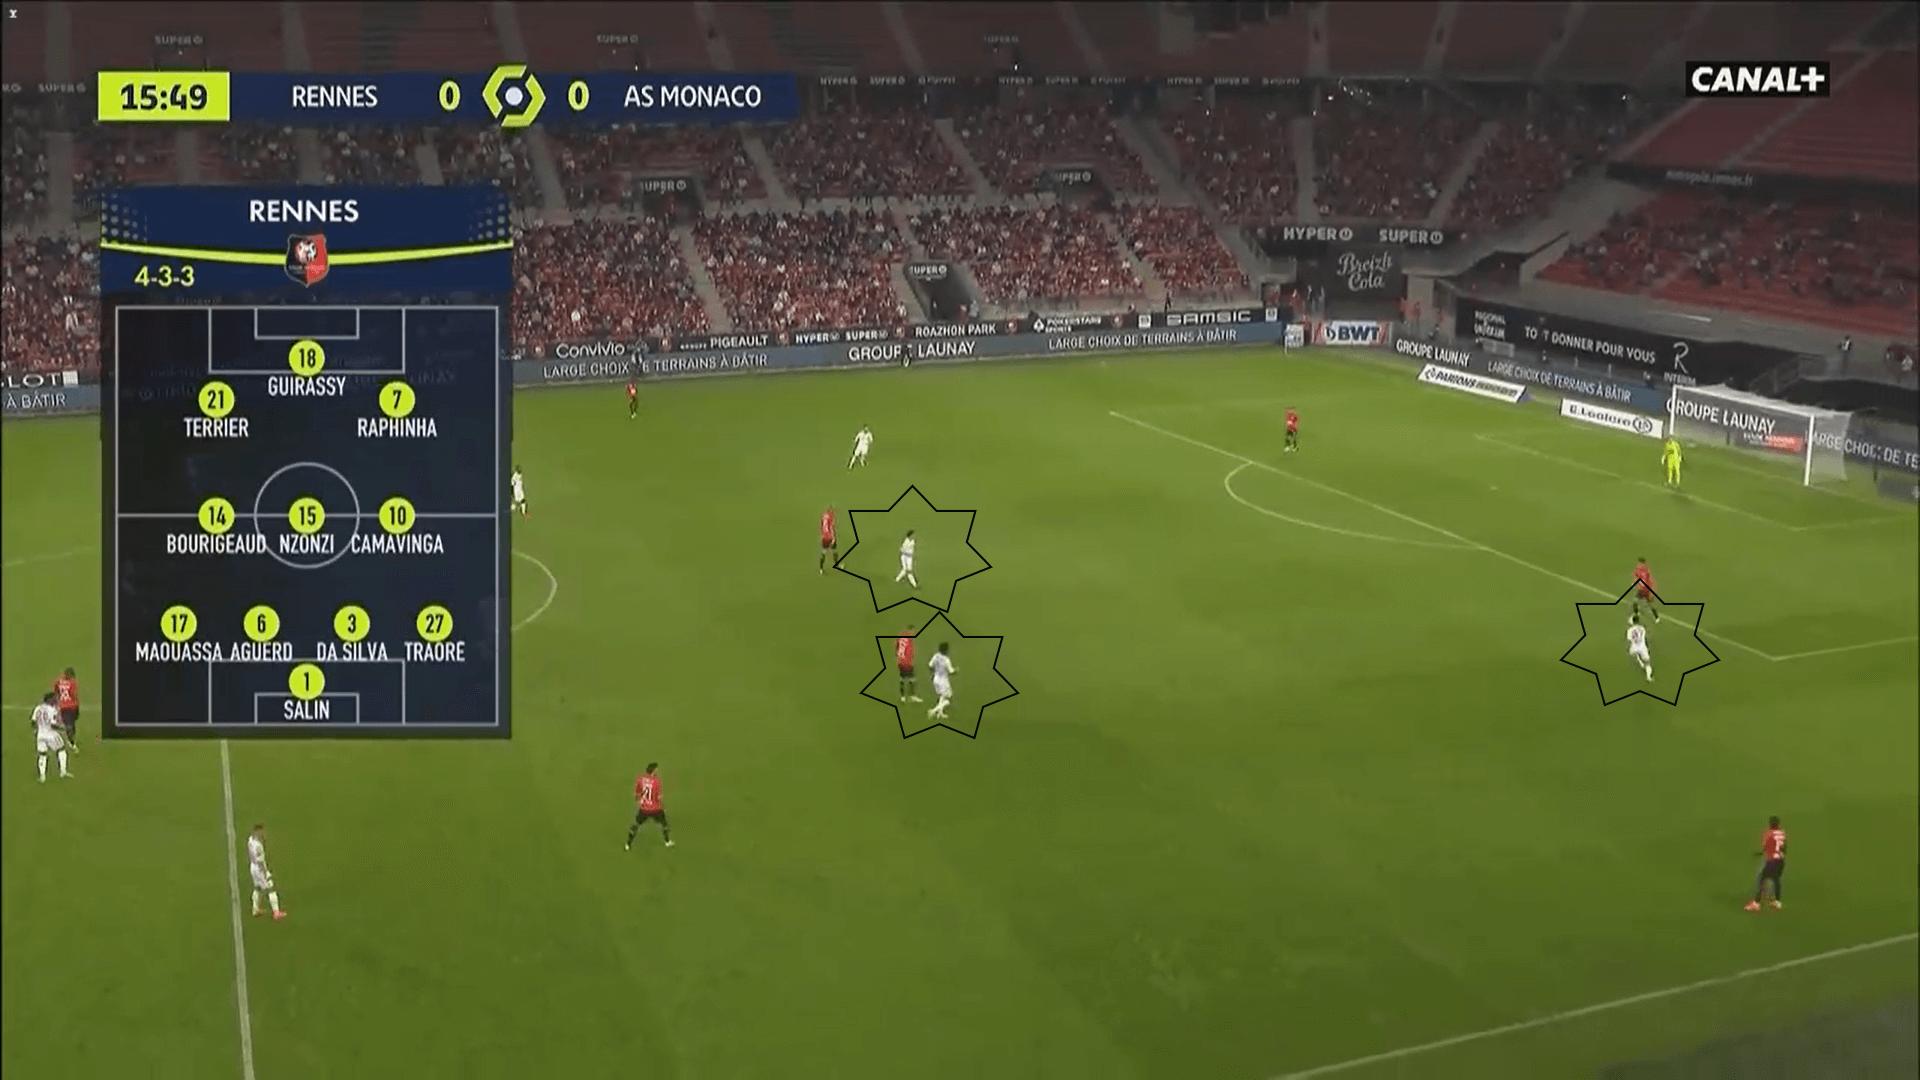 Ligue 1 2020/21: Rennes vs Monaco - tactical analysis tactics